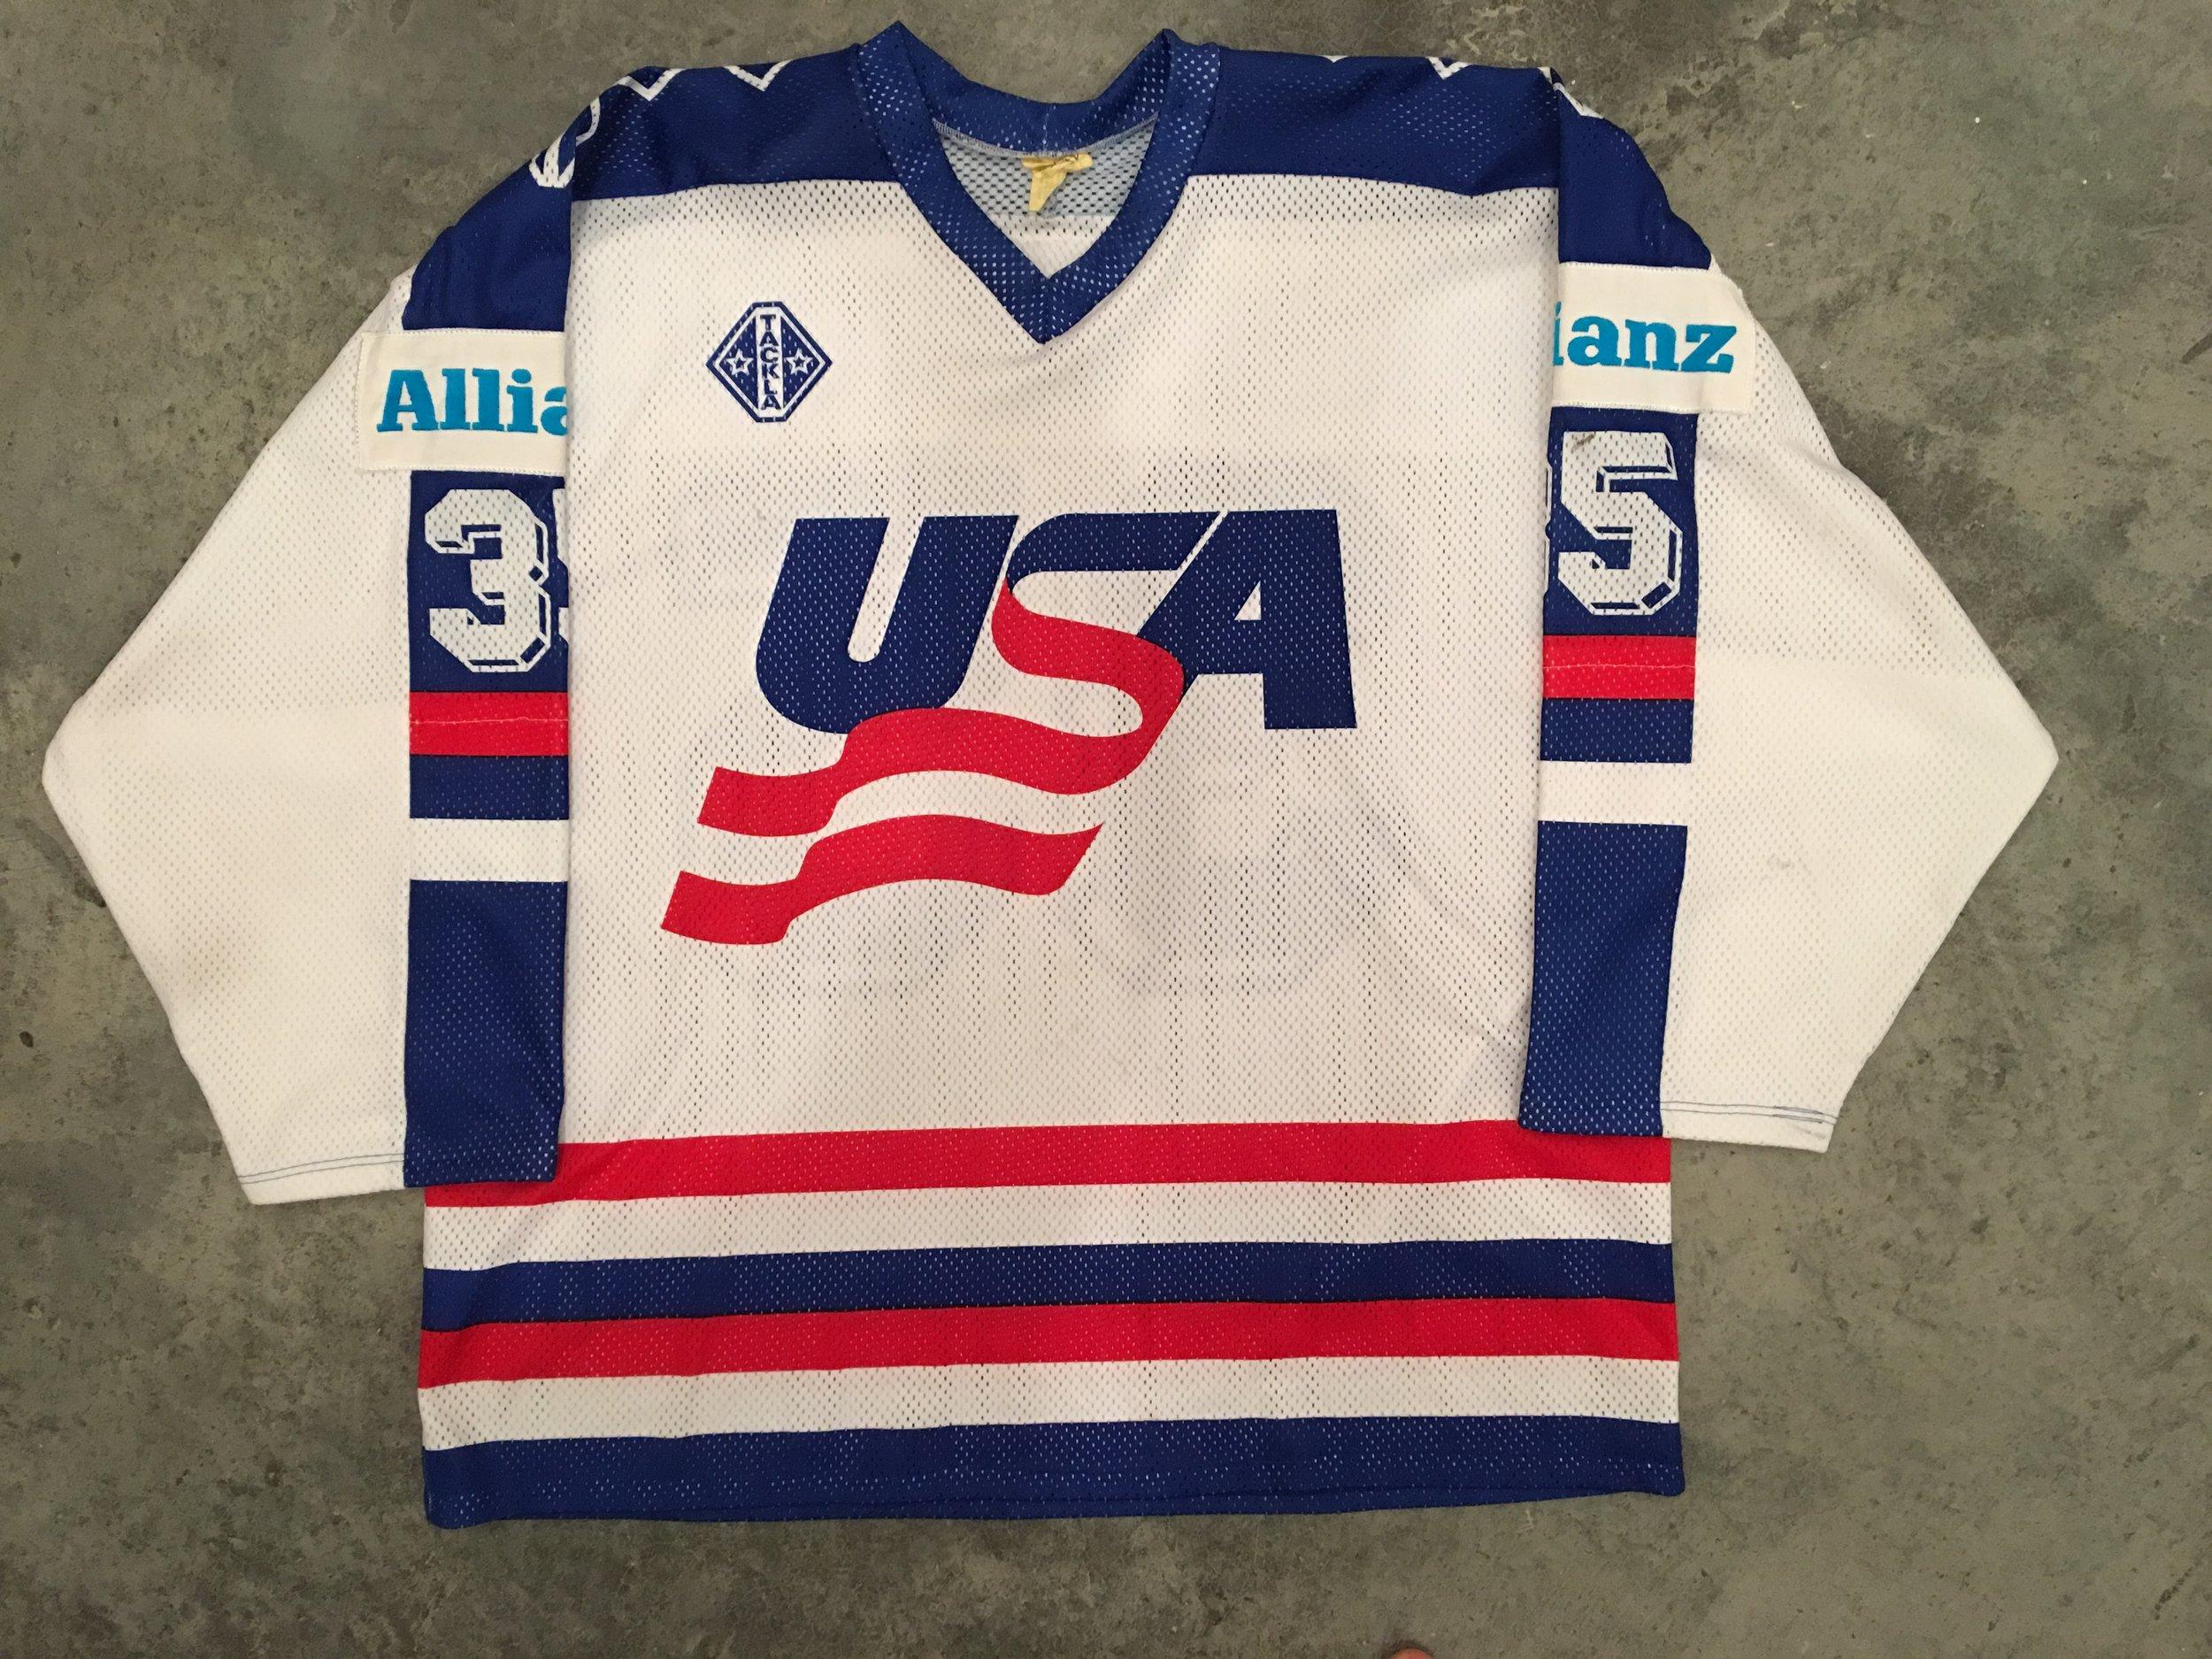 1991 World Championships Team USA game worn jersey